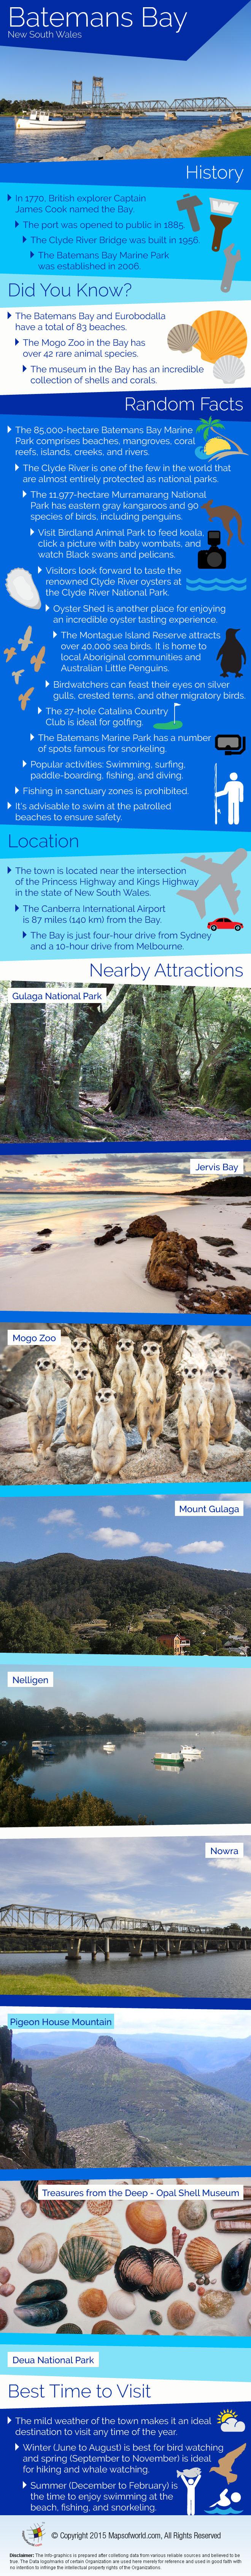 Batemans Bay Infographic